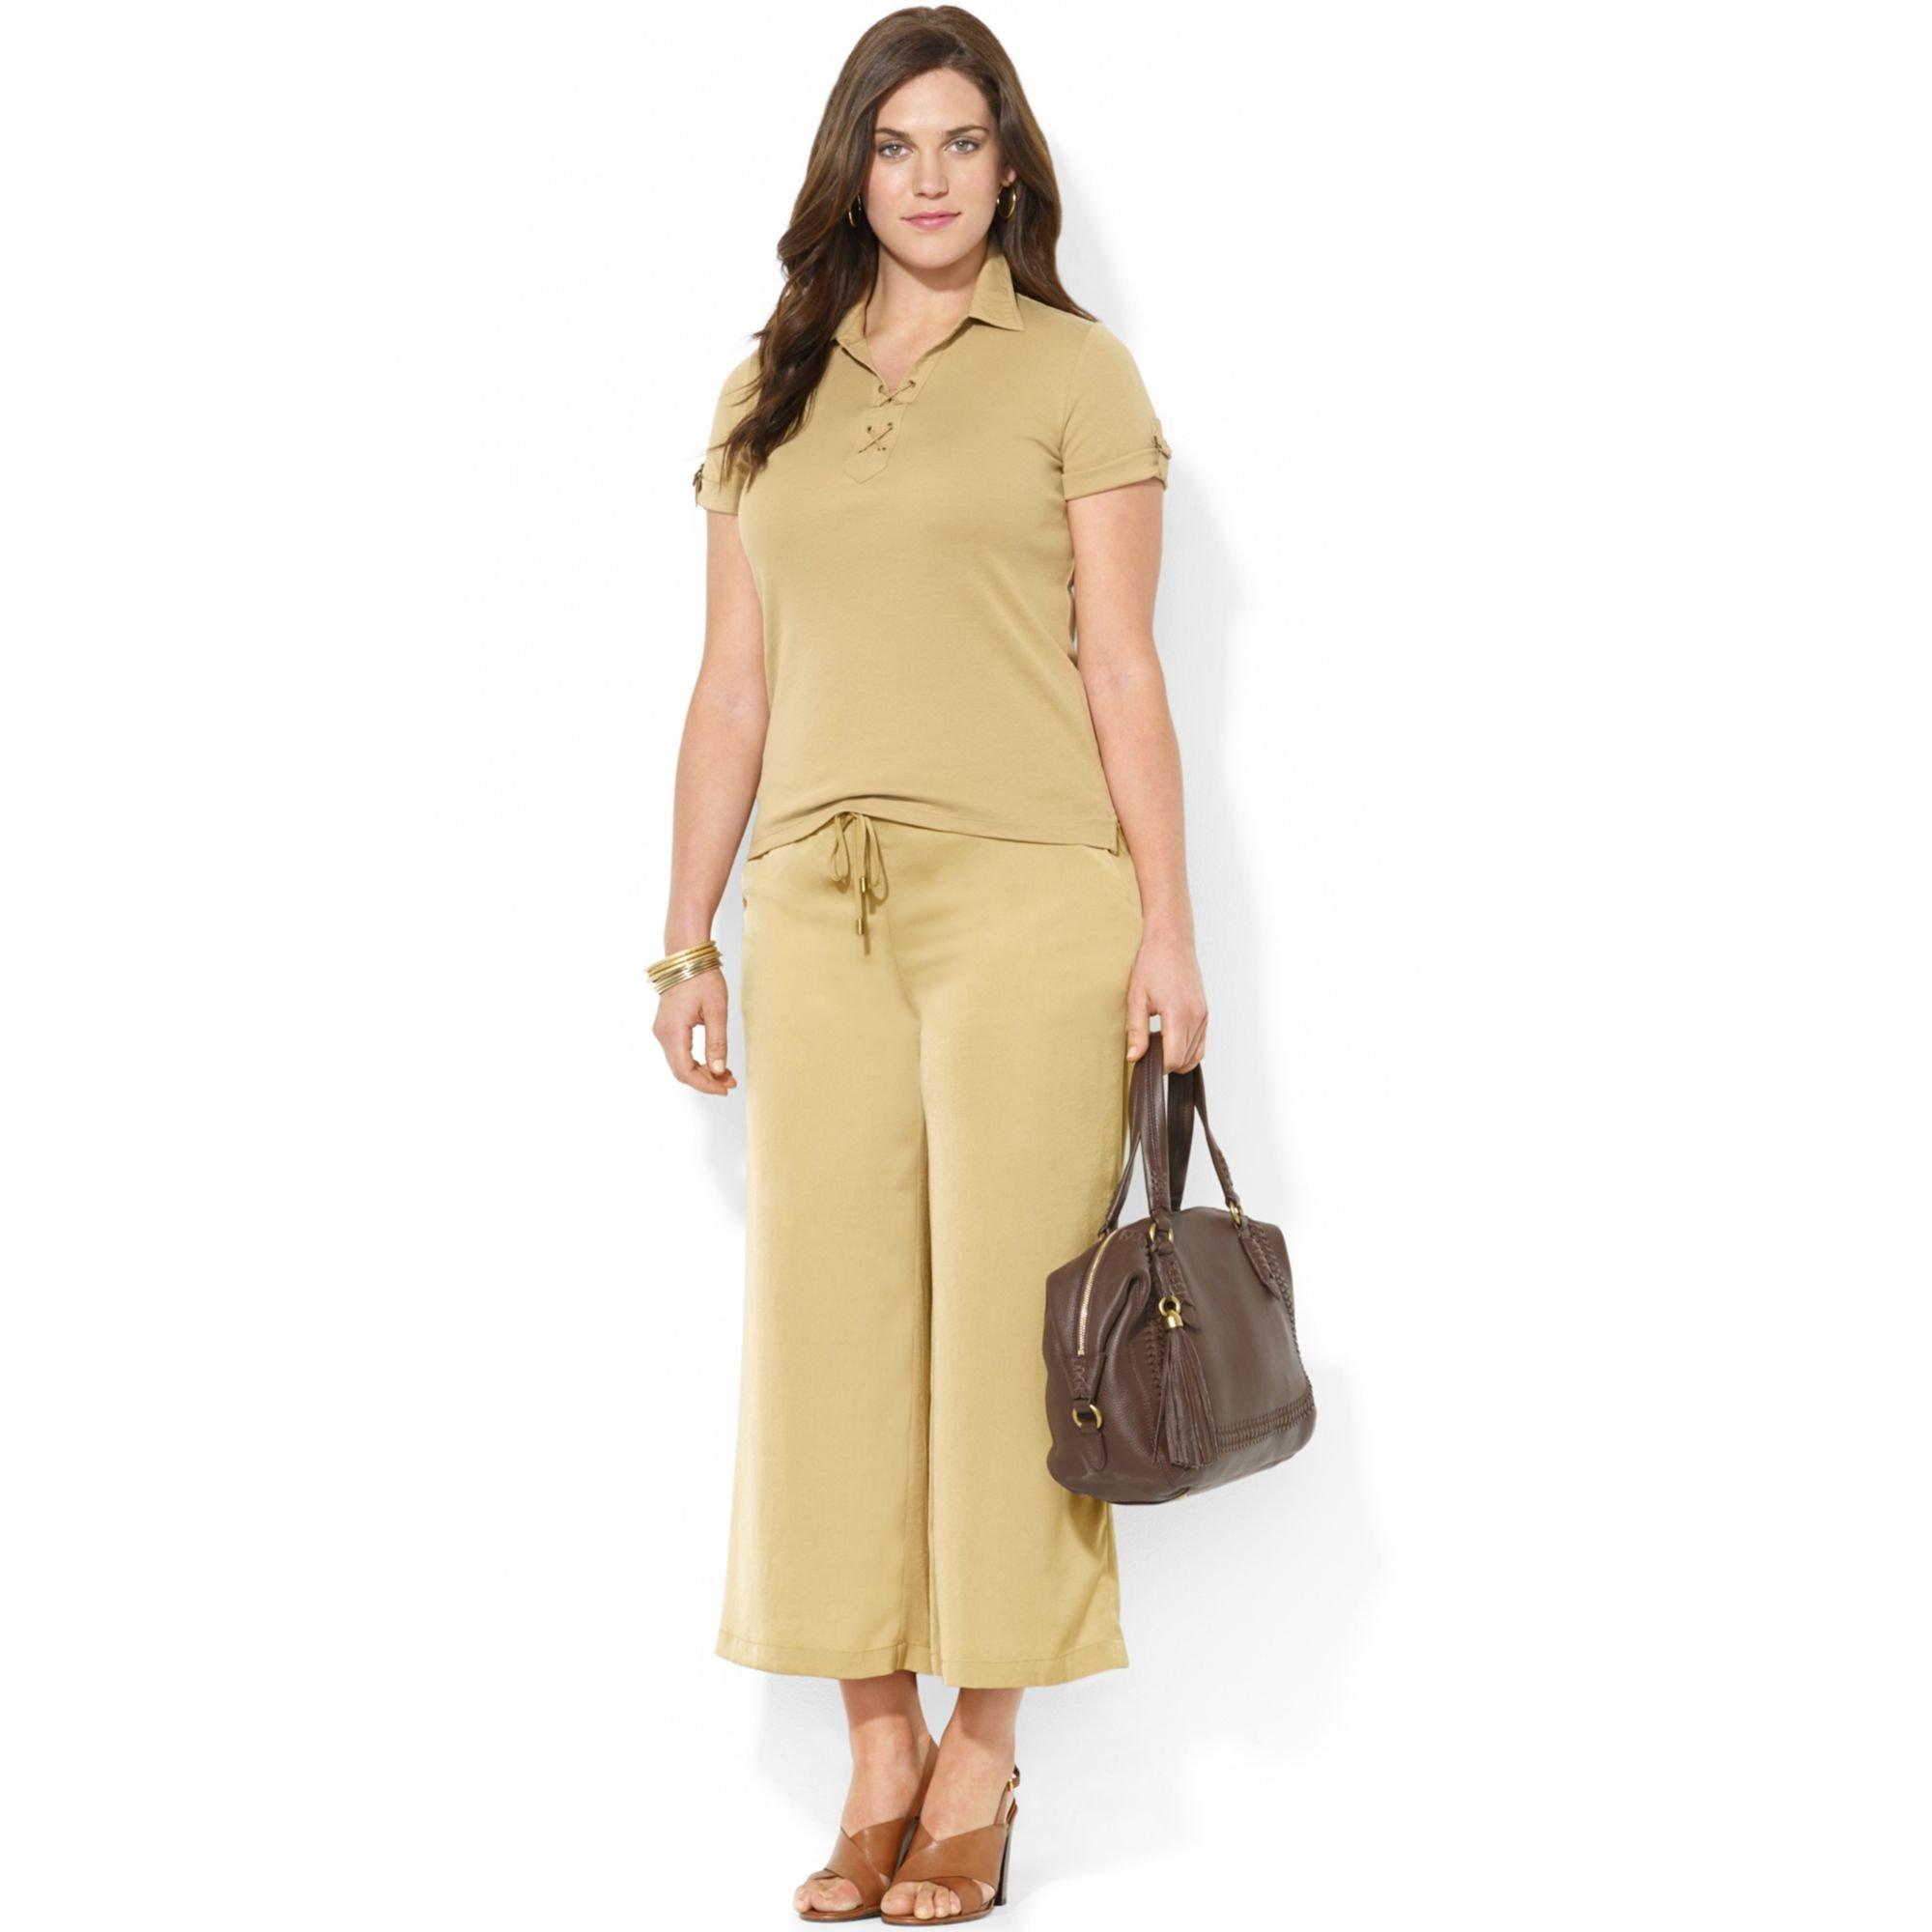 Lauren by ralph lauren Plus Size Cropped Wideleg Soft Pants in ...